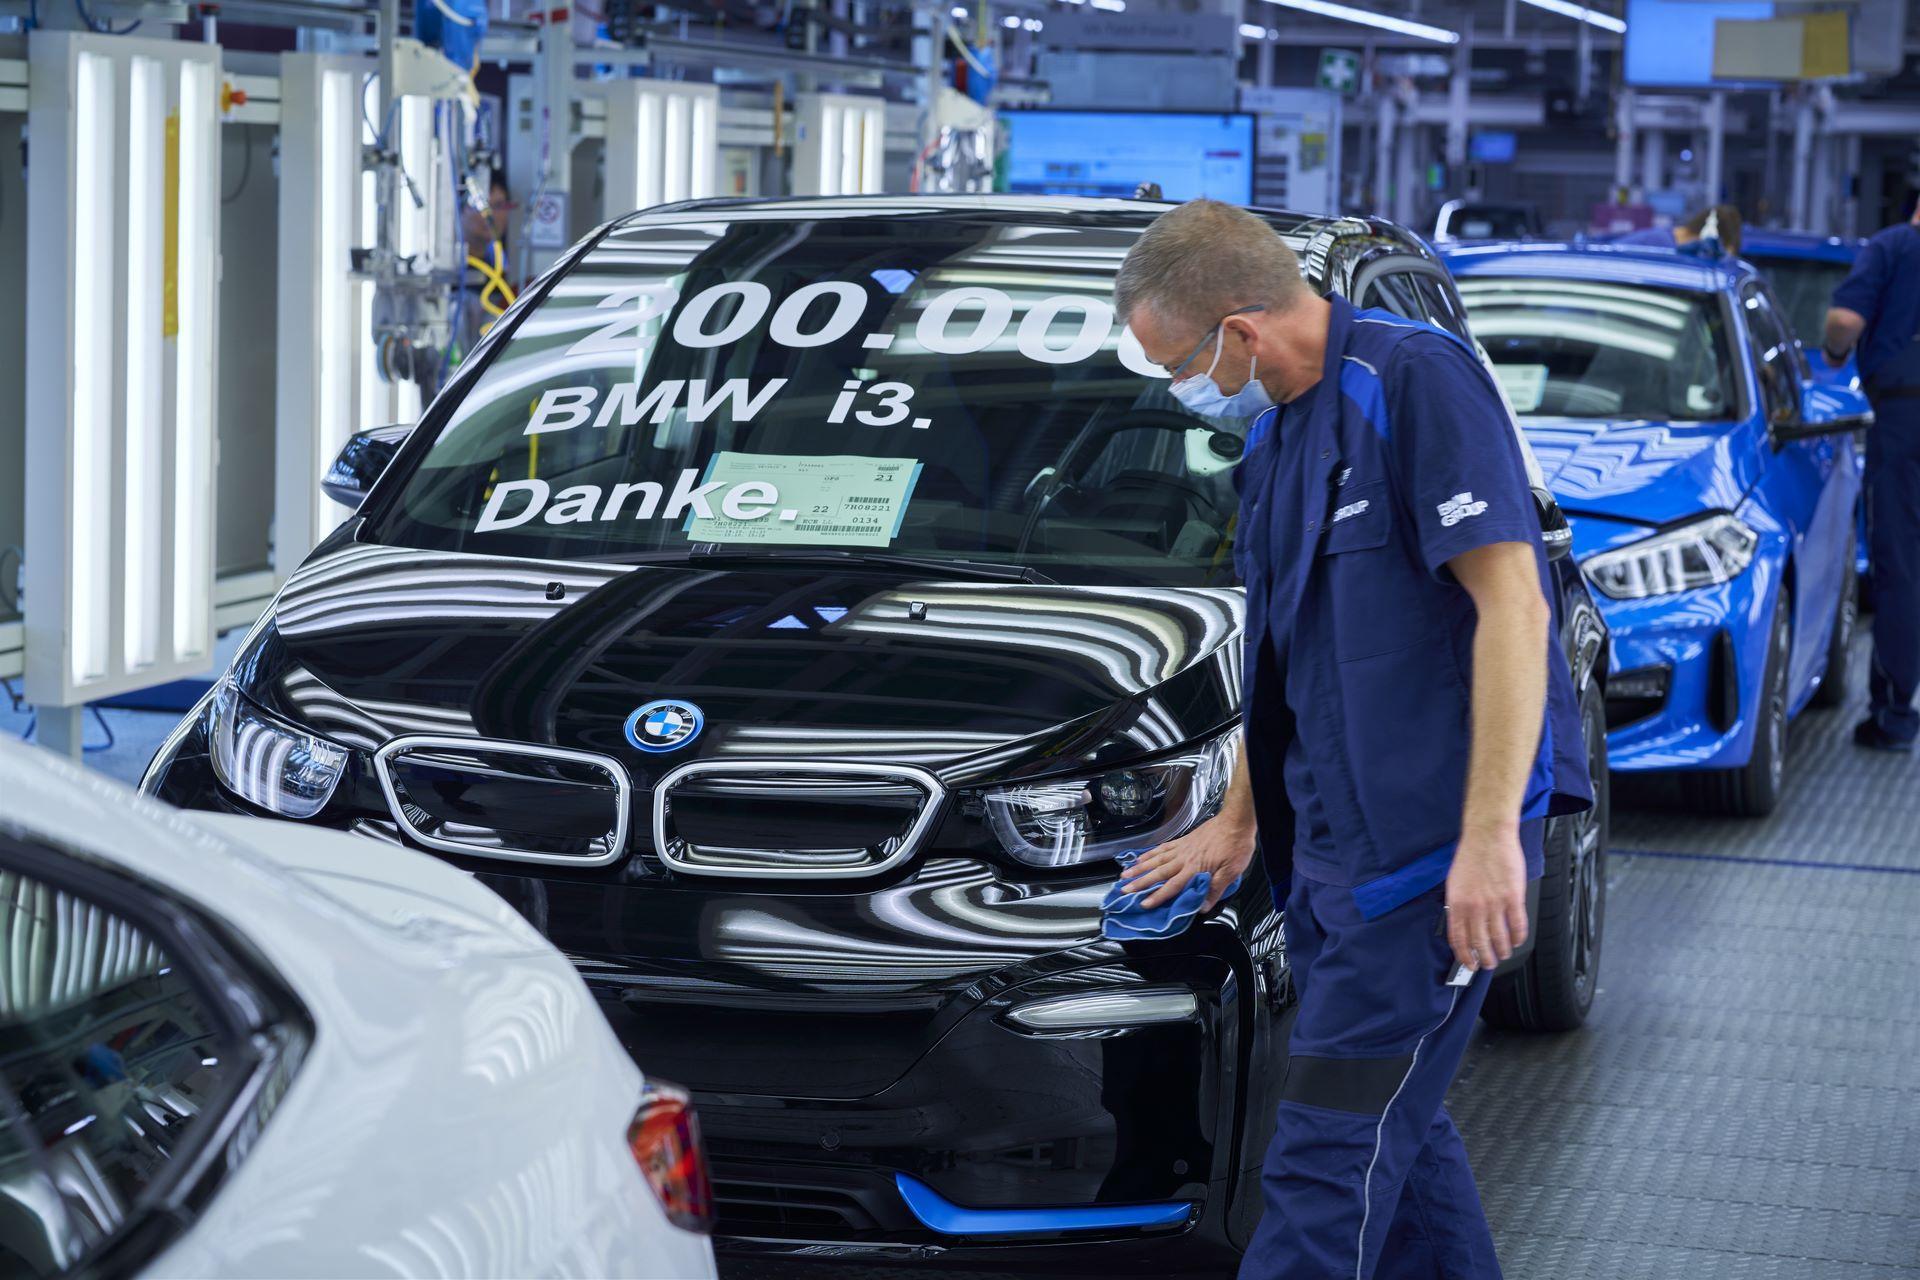 BMW-i8-plant-production-54